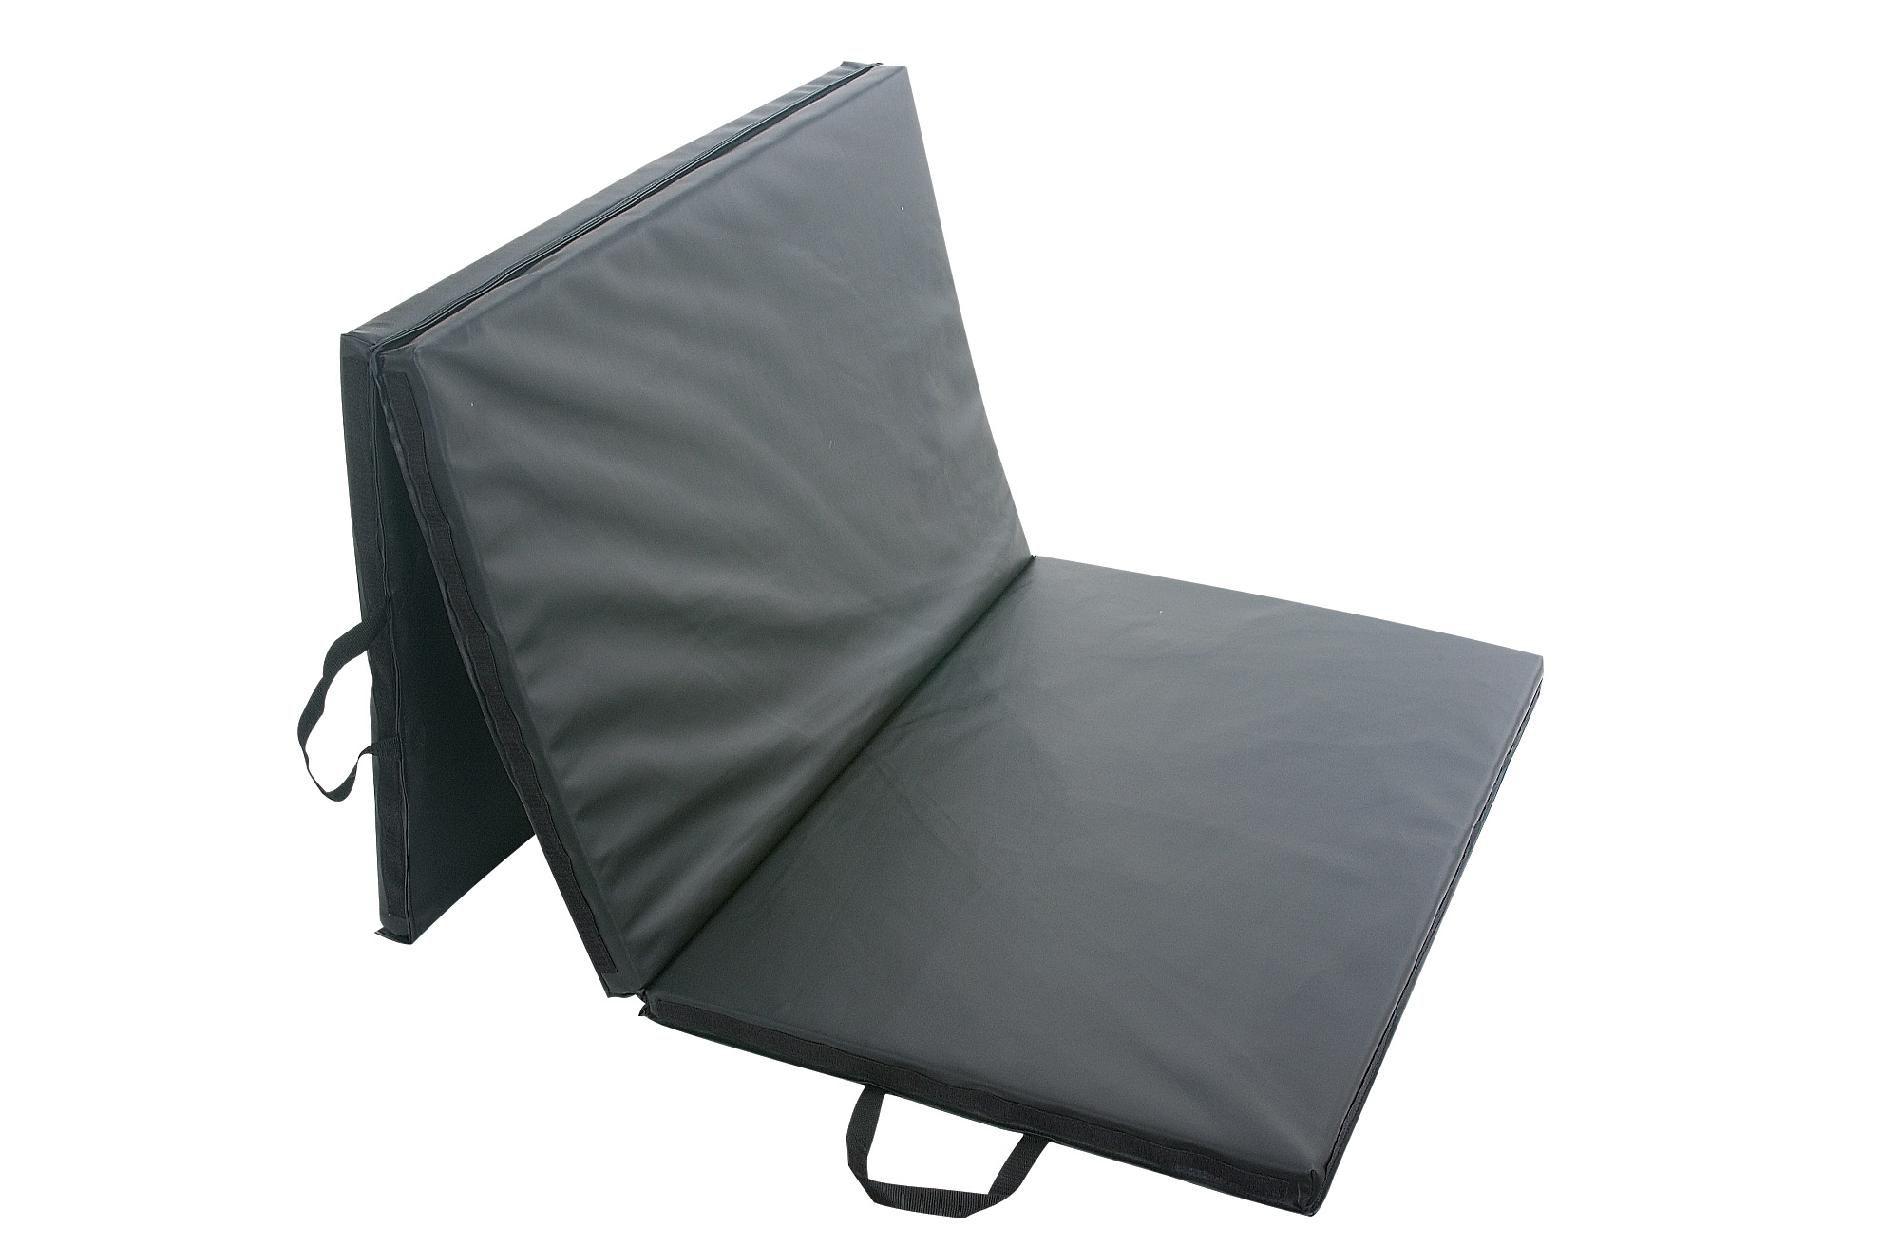 Sunny Health Fitness Folding Gym Mat Black Folding Gym Mat Gym Mats Mat Exercises